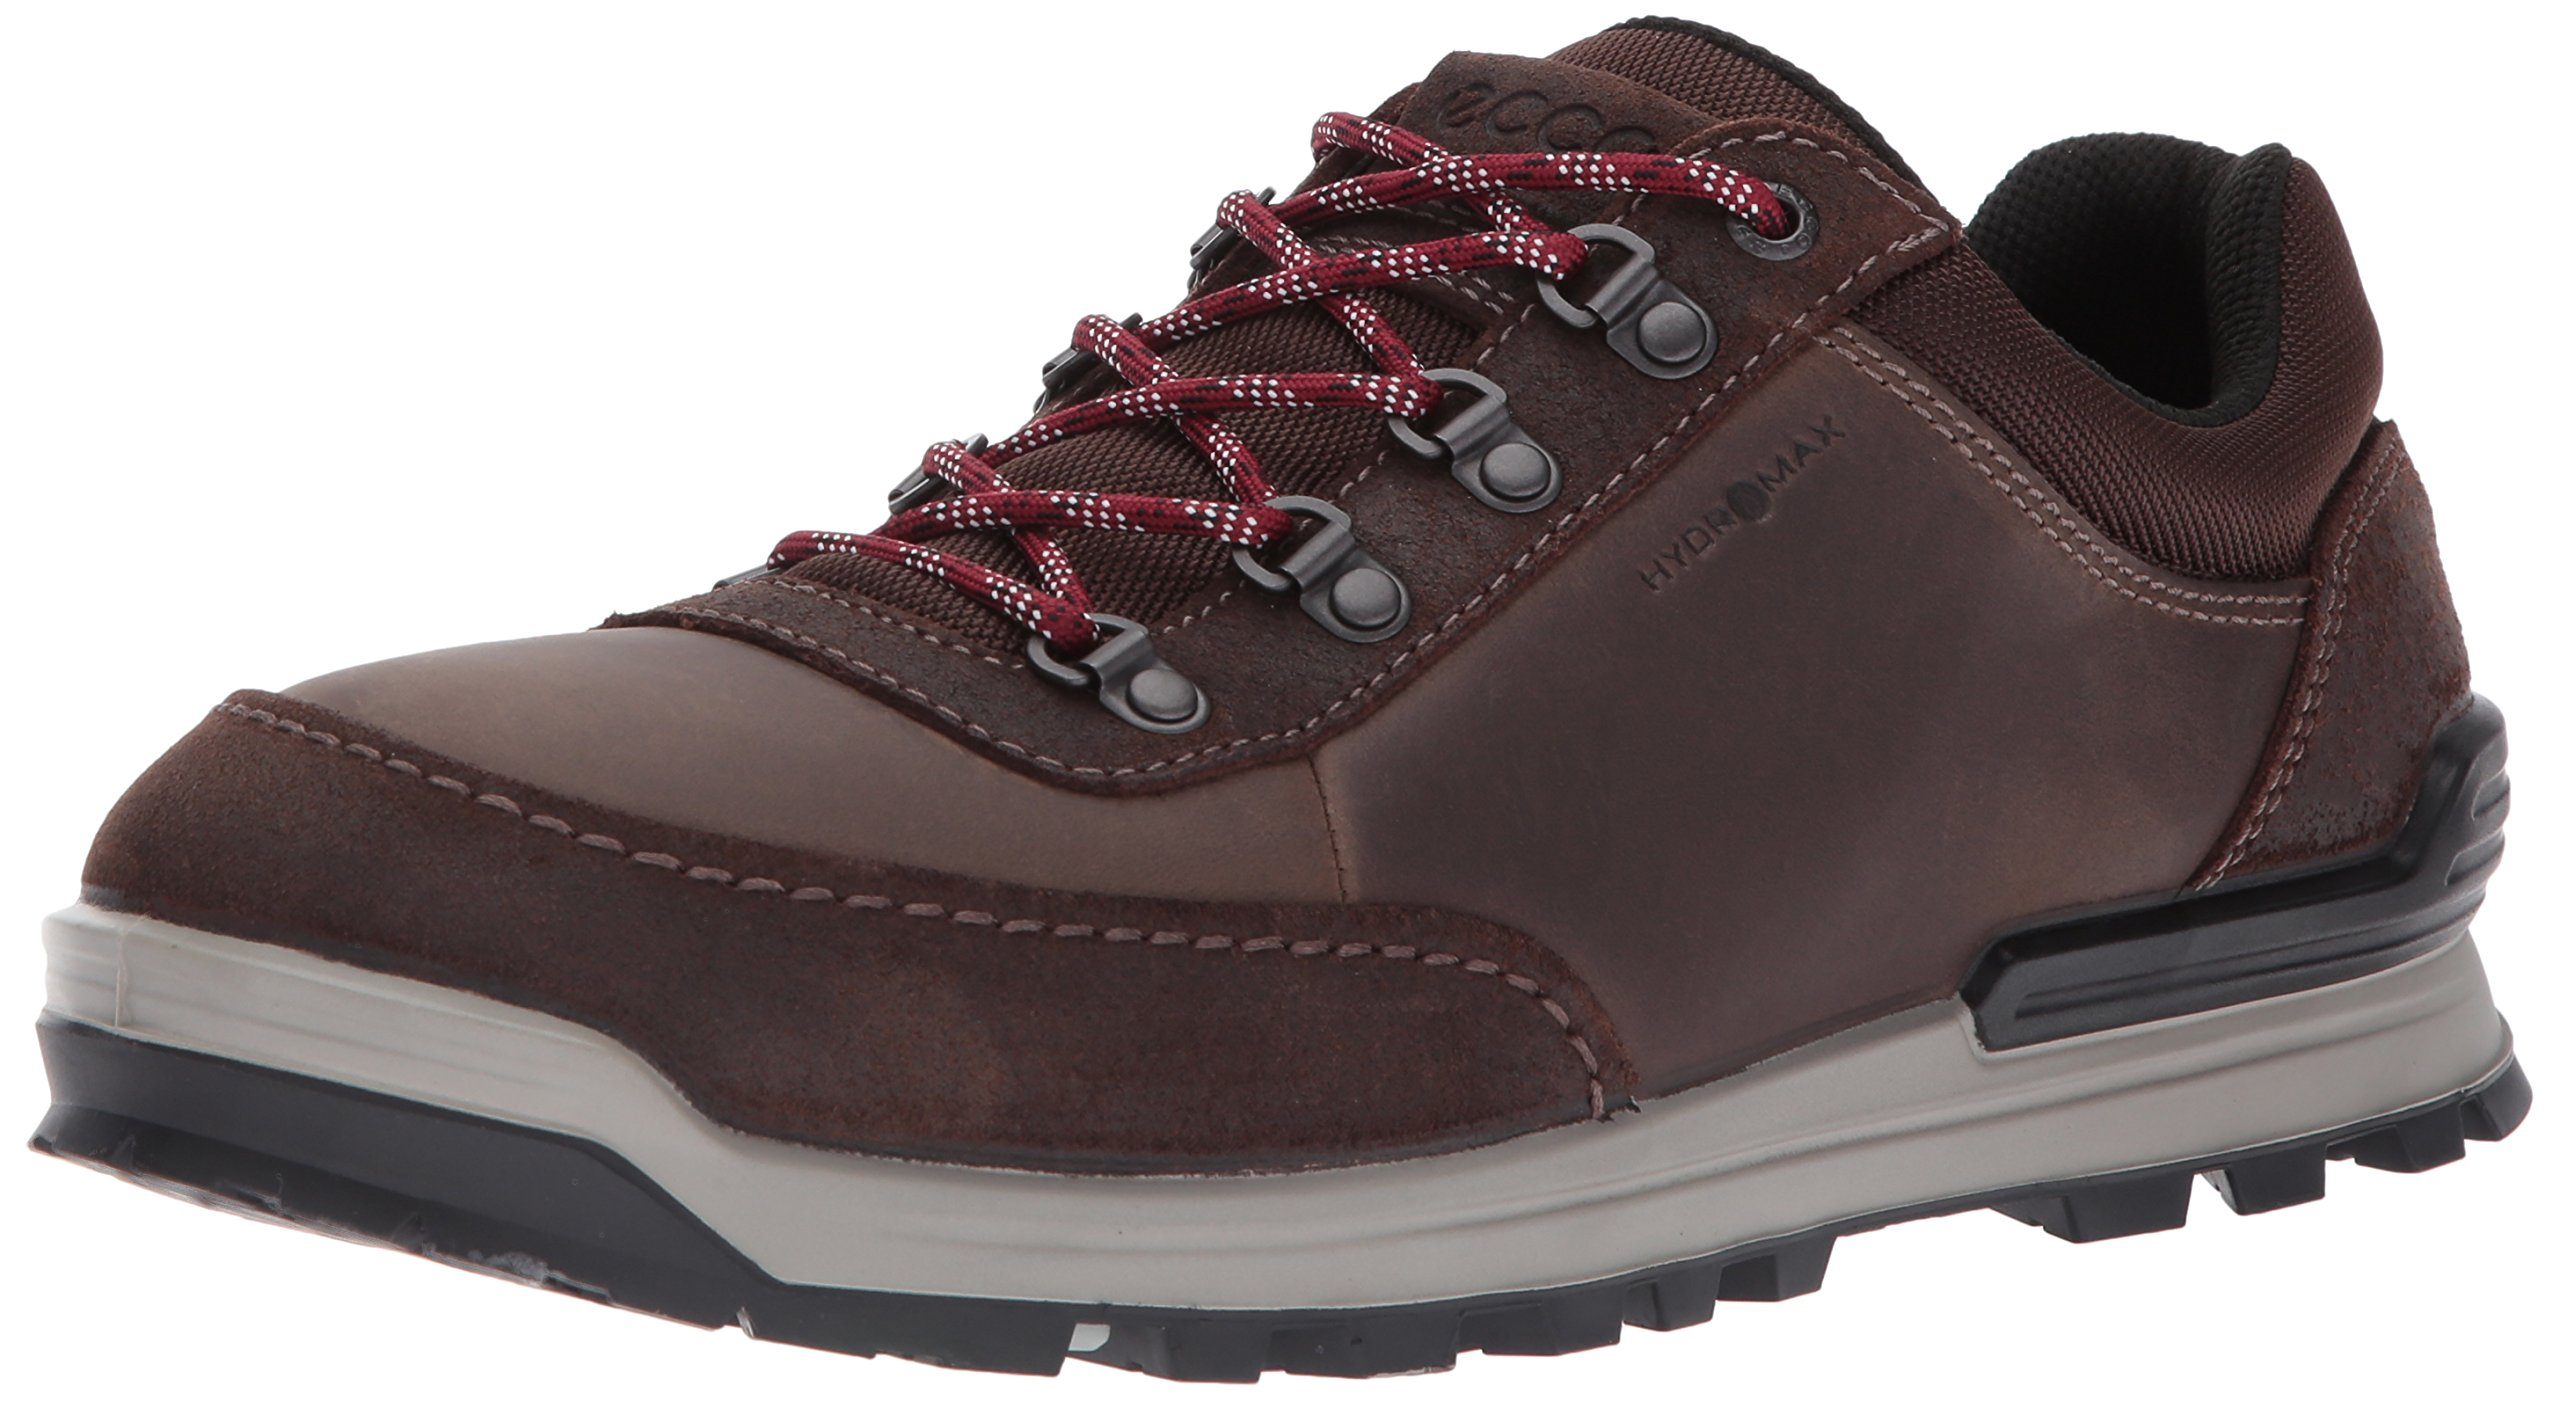 ECCO Men's Oregon Retro Sneaker Hiking Boot,Coffee/Coffee,40 EU/6-6.5 US